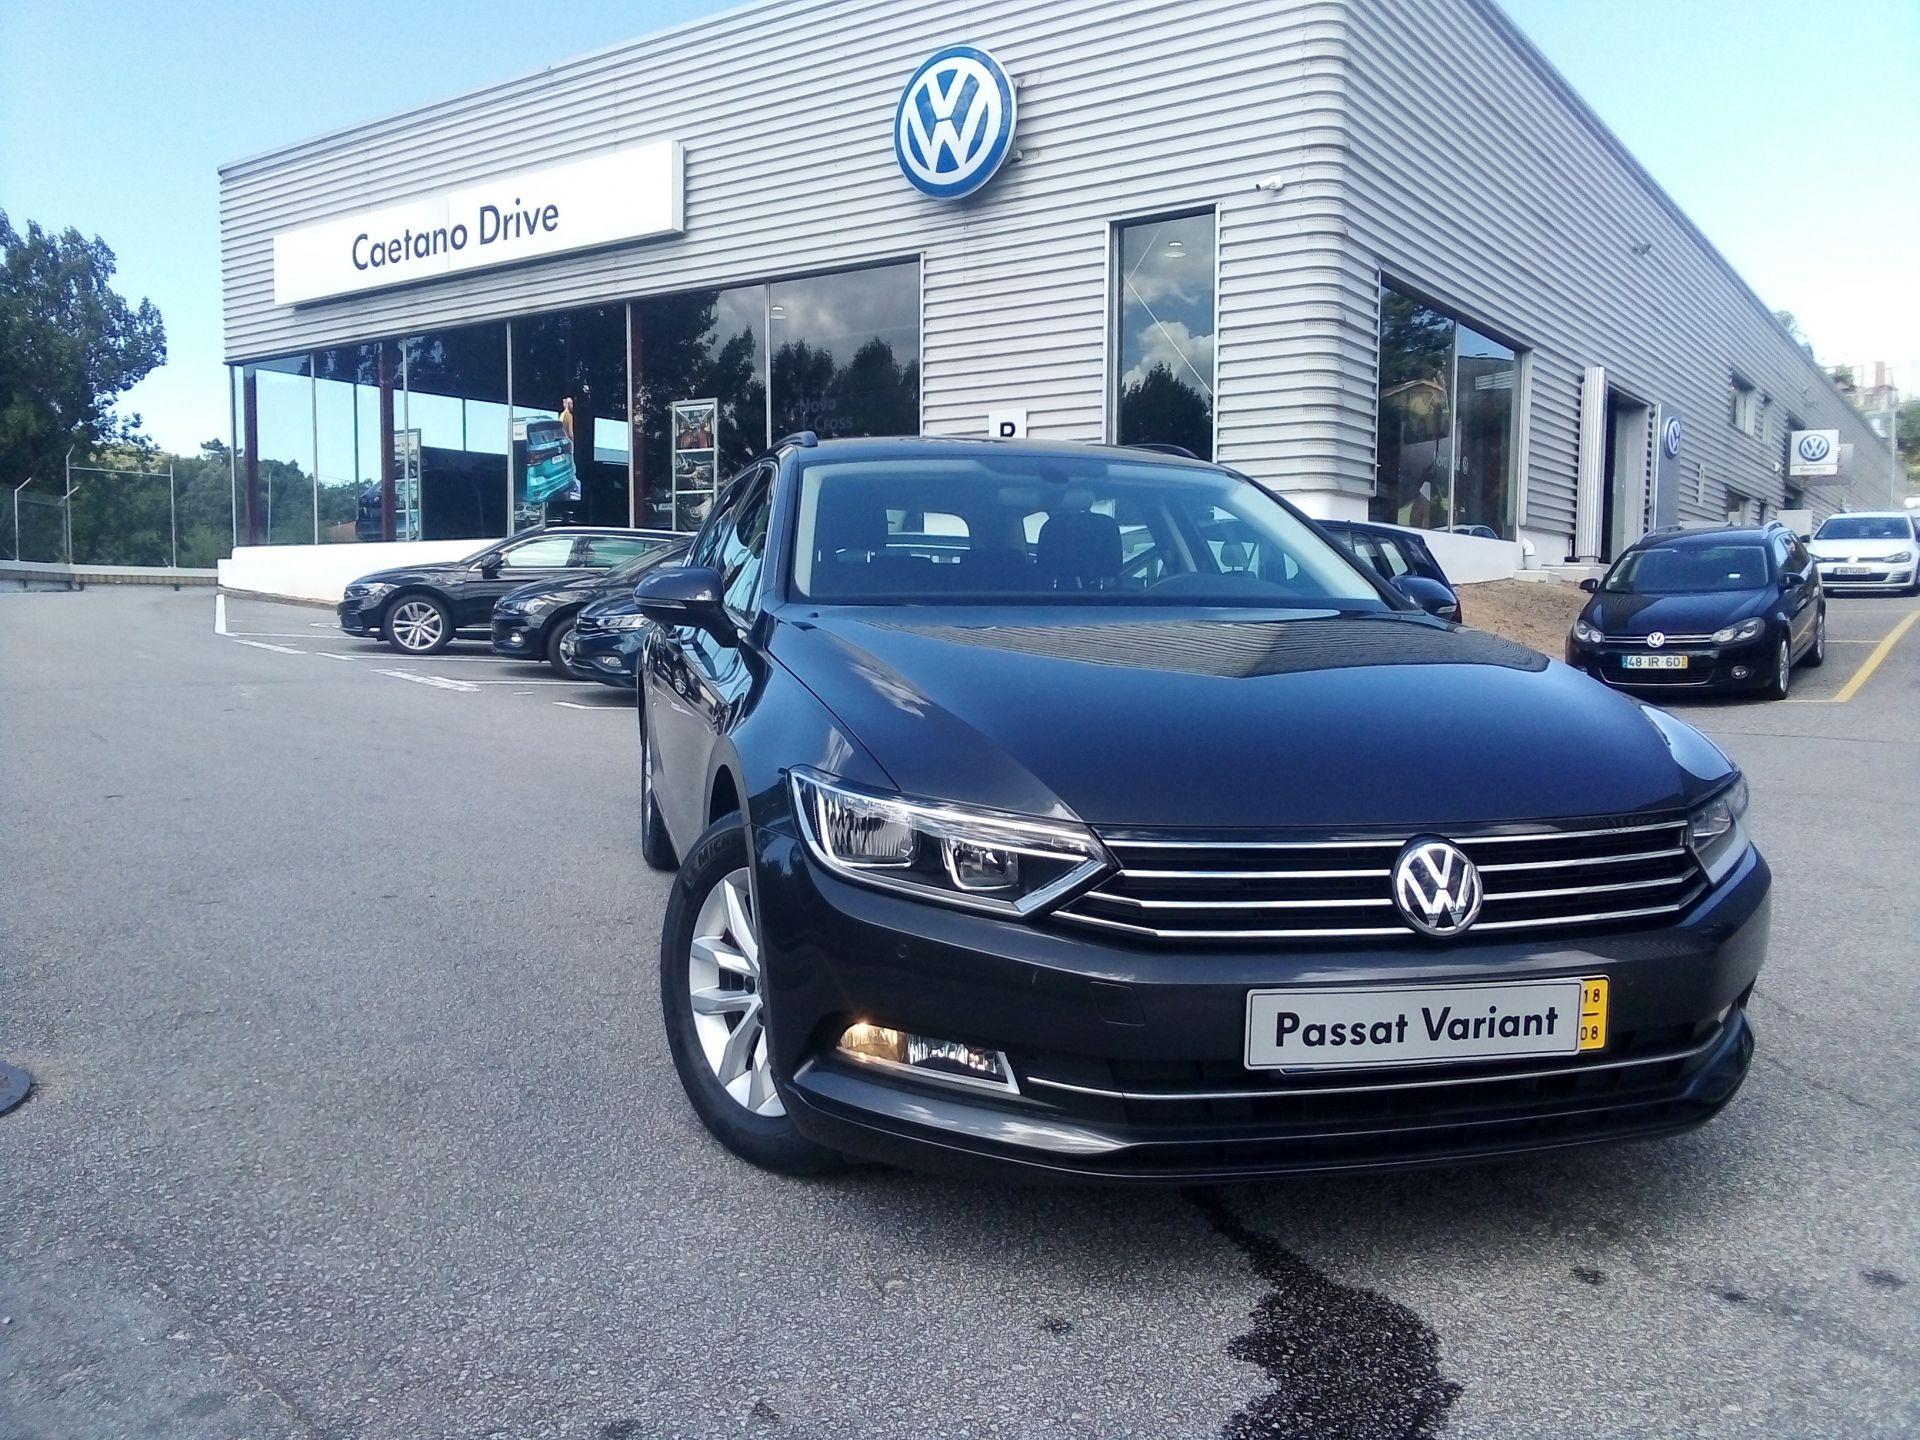 Volkswagen Passat 1.6 TDI CONFORTLINE VARIANT segunda mão Porto